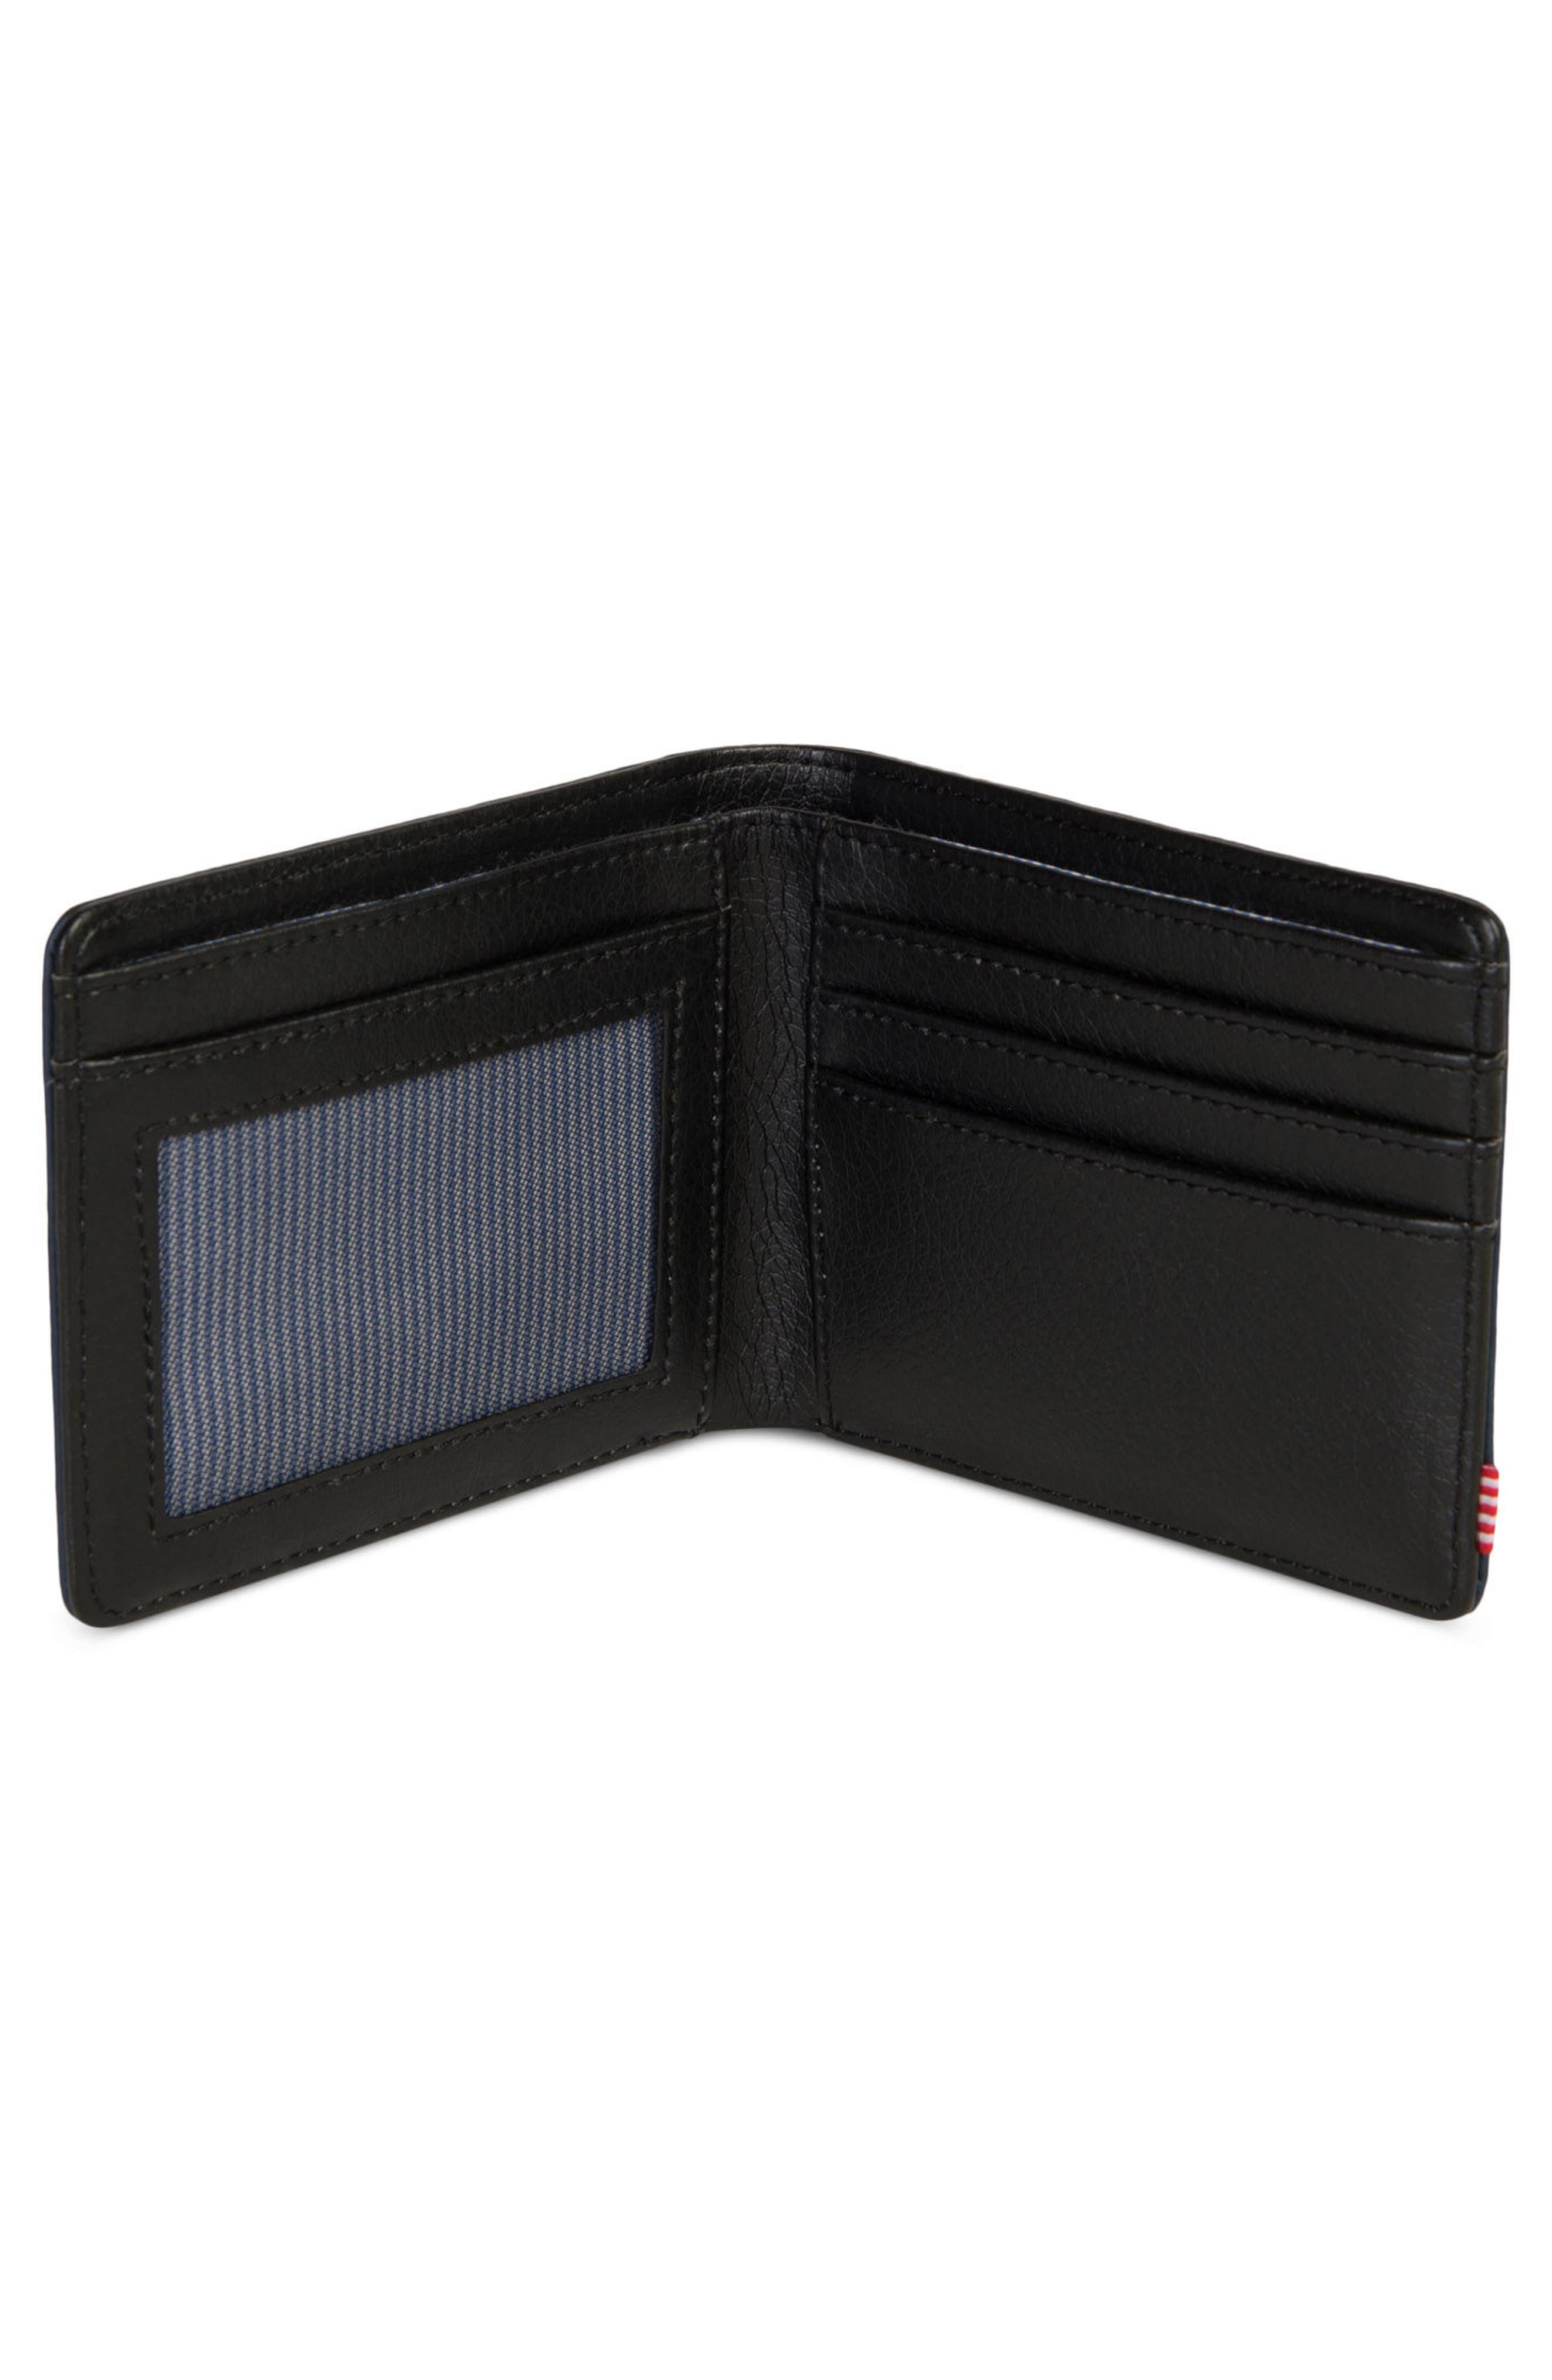 Hank Leather Wallet,                             Alternate thumbnail 2, color,                             Black